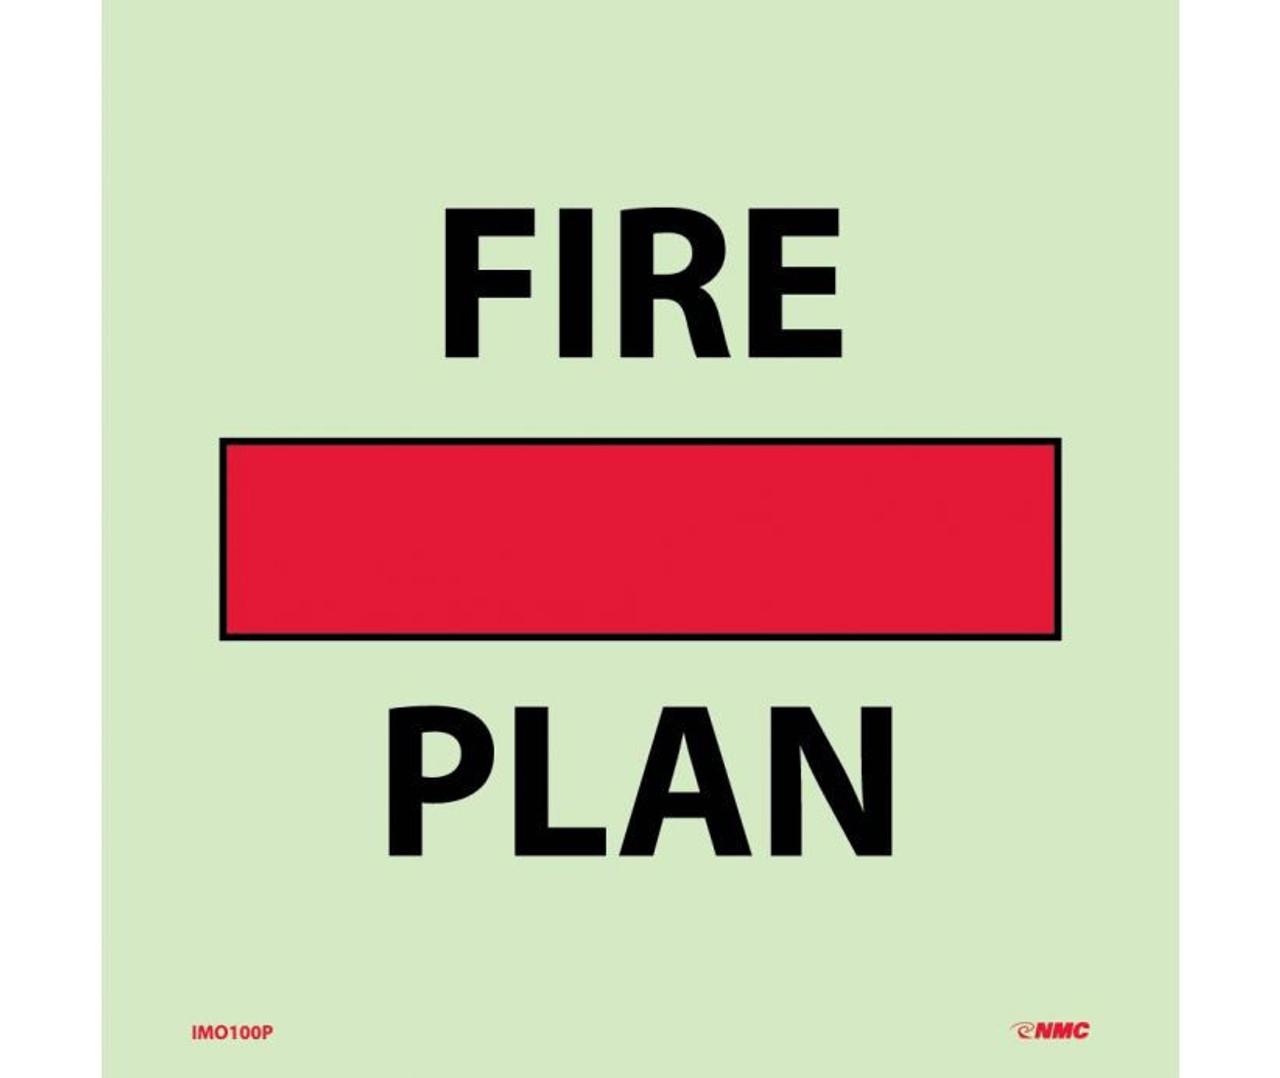 Imo Symbol Fire Control Safety Plan 6x6 Glow Vinyl Laminated